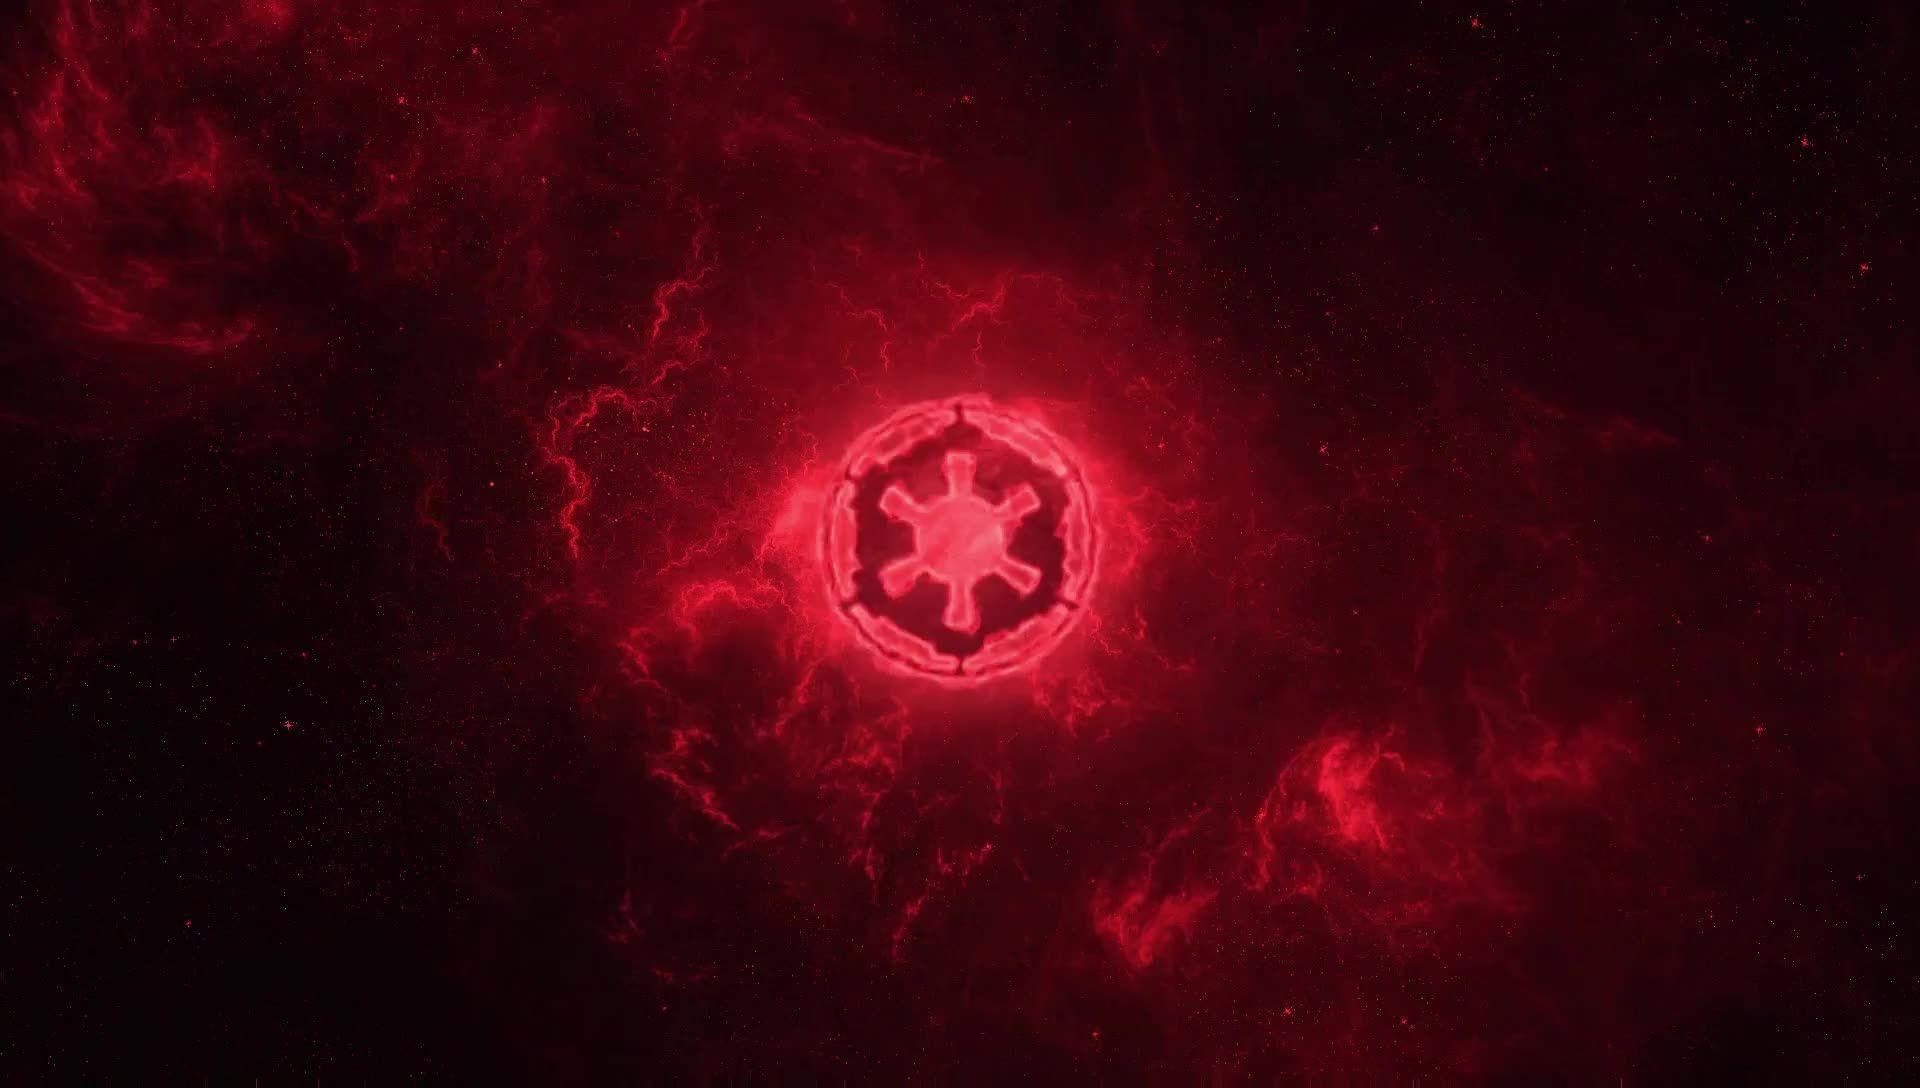 Star Wars Archives DesktopHut